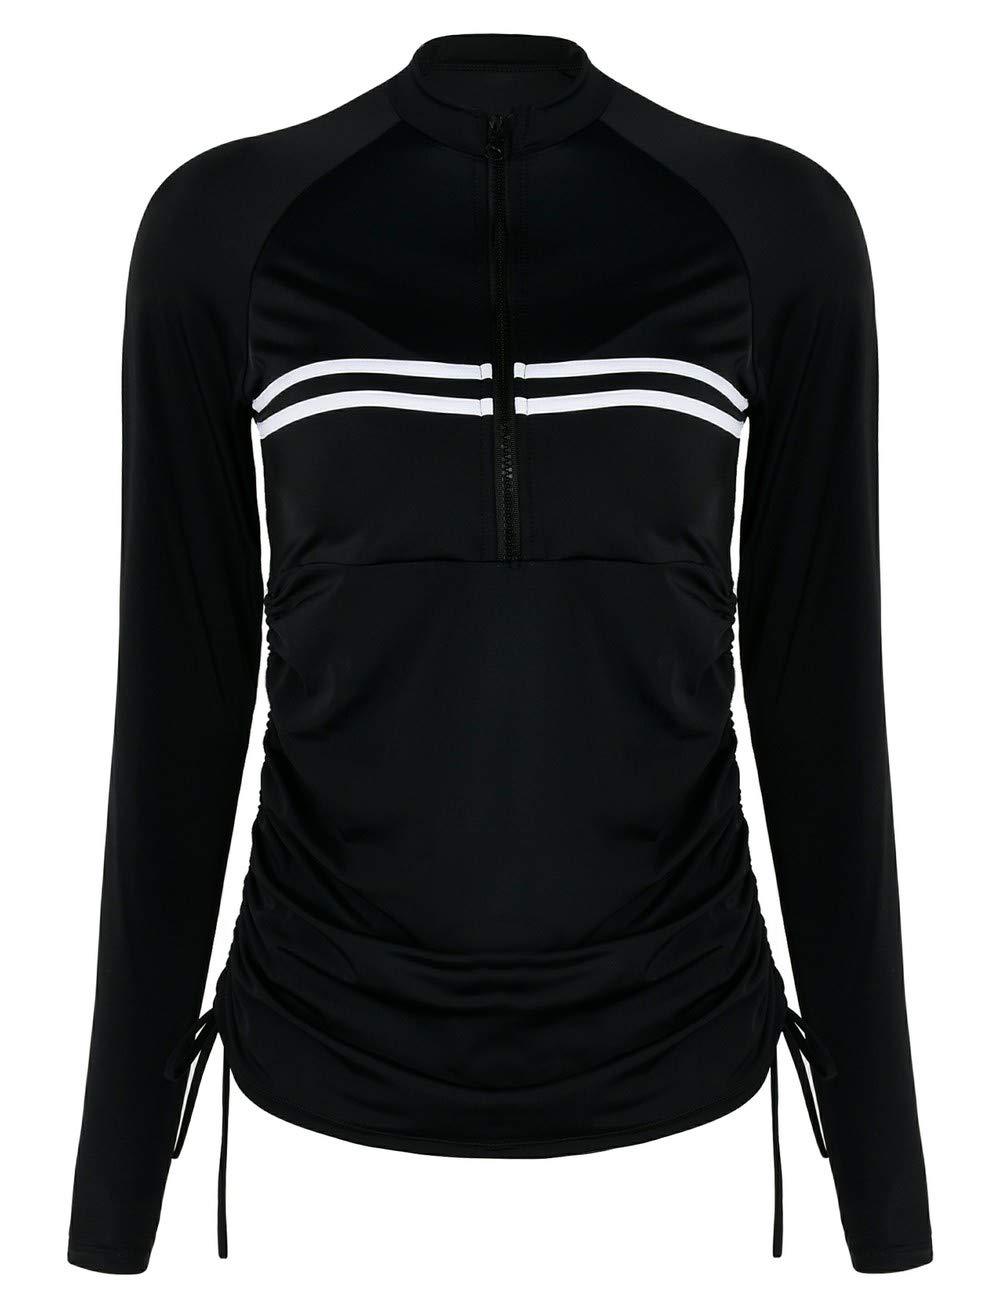 Septangle Women's UPF 50+ Long Sleeve Rash Guard Swimsuit Zipper Swimwear Athletic Tops